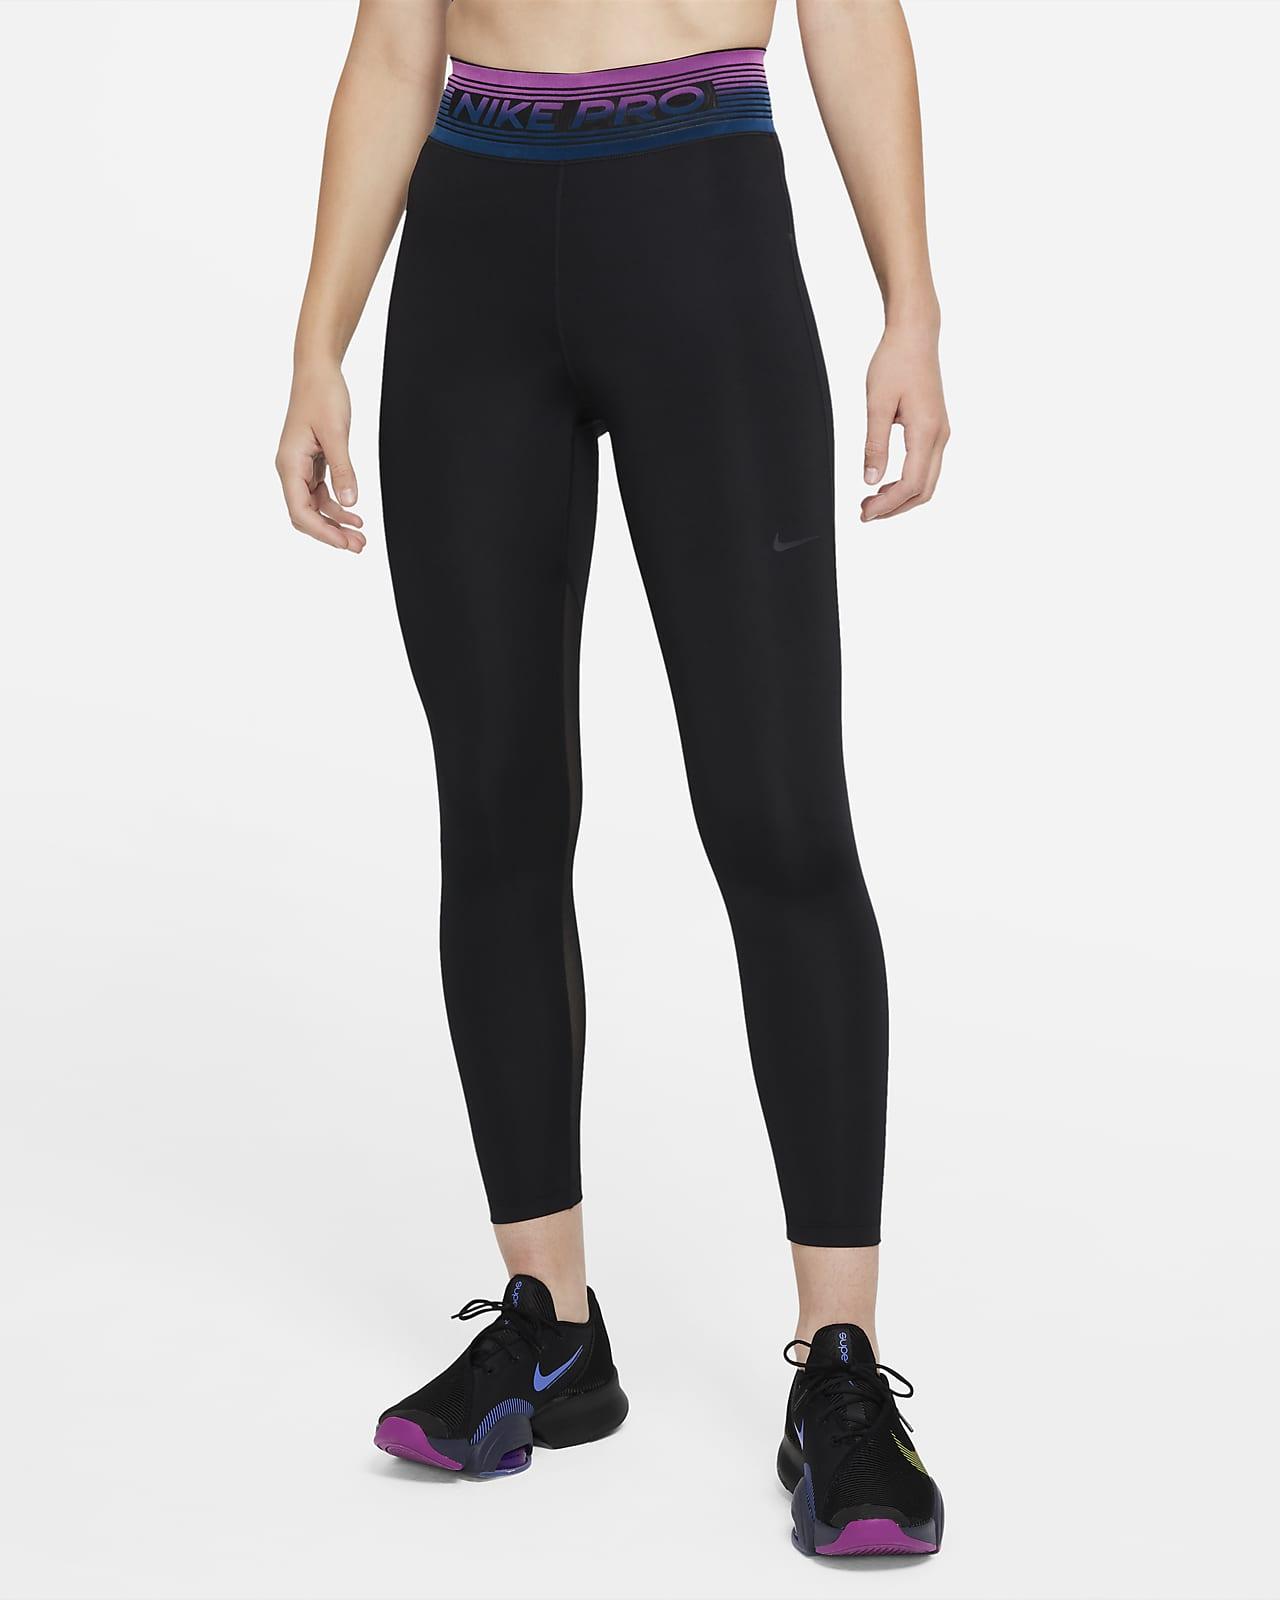 Leggings de 7/8 de tiro medio para mujer Nike Pro